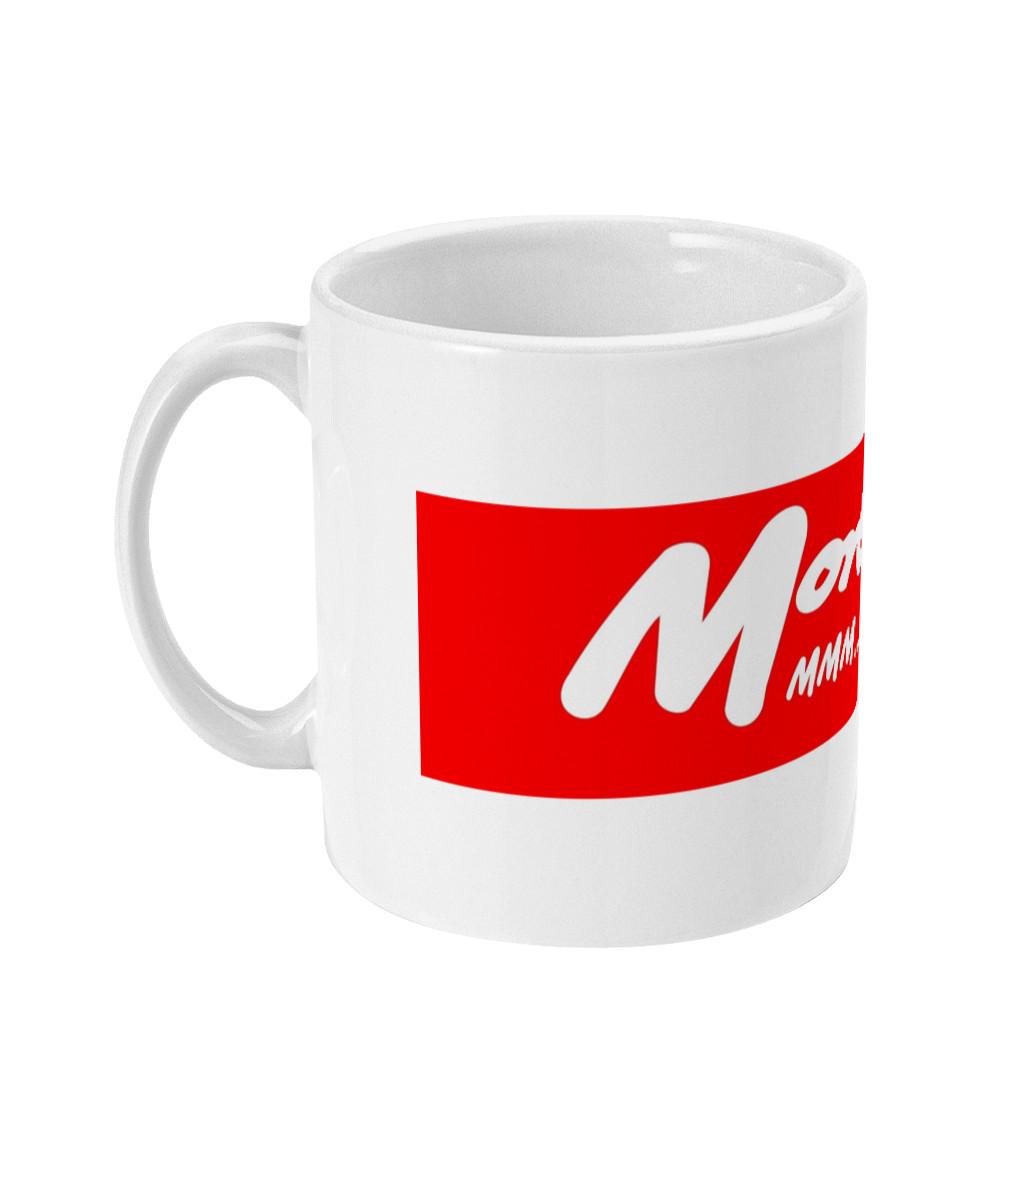 Morley's fried chicken shop mug